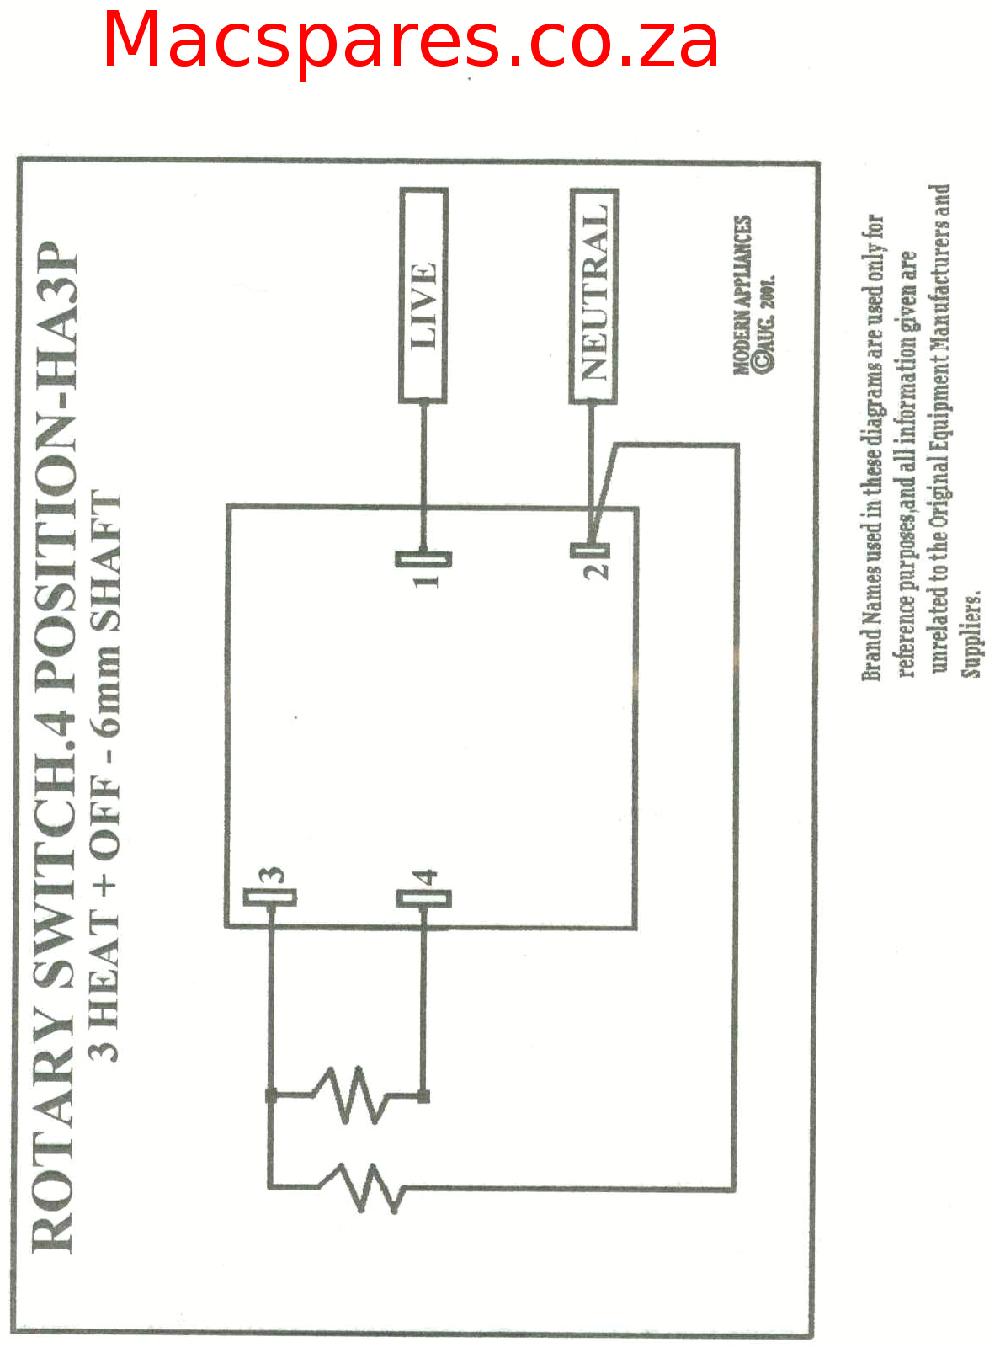 ego energy regulator a nf1 ser energy regulator a simmerstat a strix energy regulator a rotary 3 heat switch a rotary 6 position switch